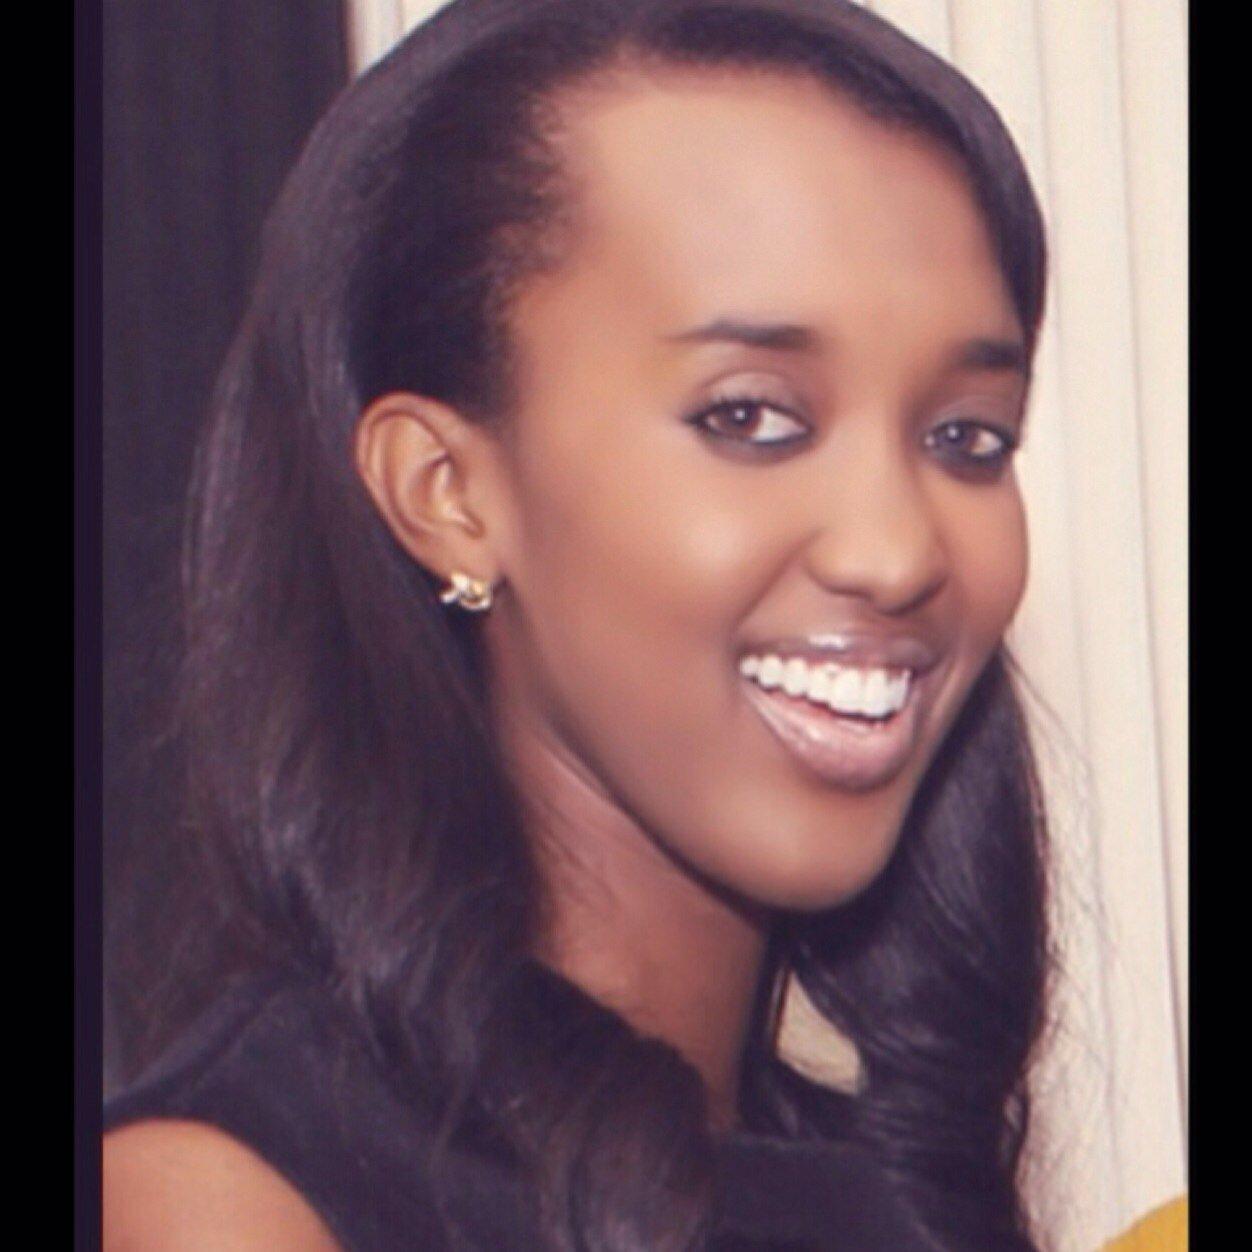 Umukobwa Wa Paul Kagame Ubwiza Afise Butuma Yipfuzwa N